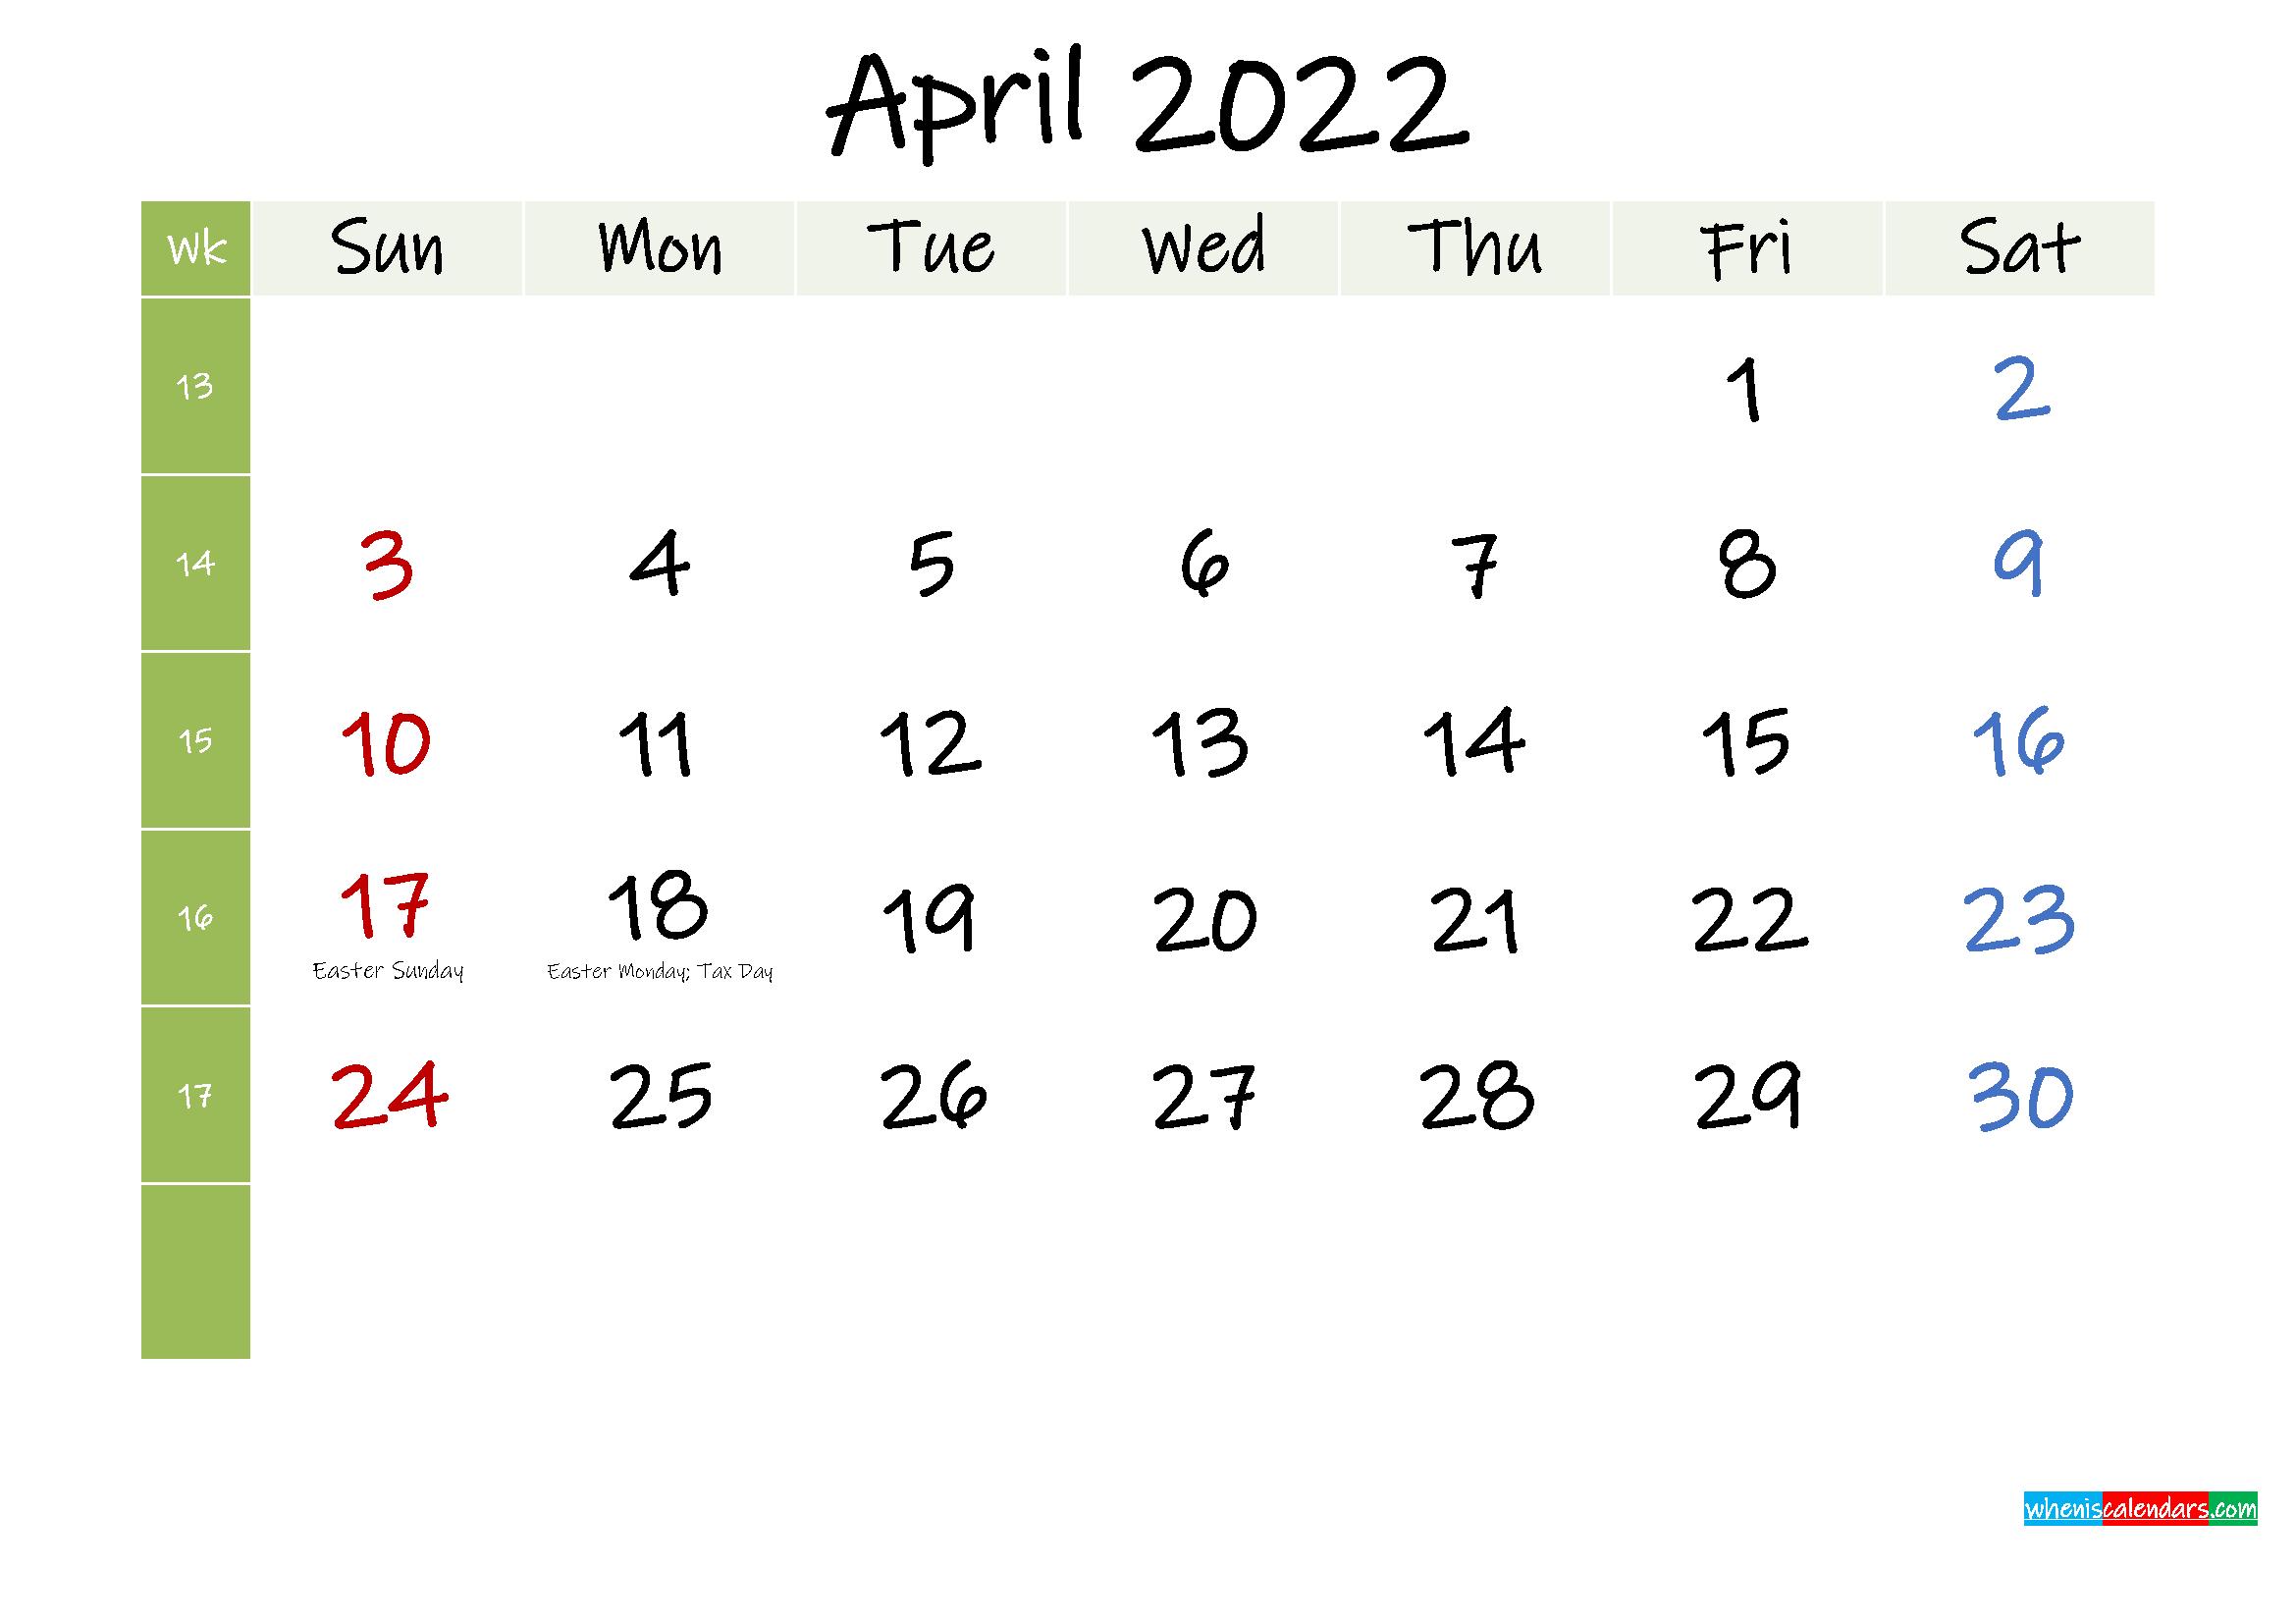 Free April 2022 Printable Calendar with Holidays